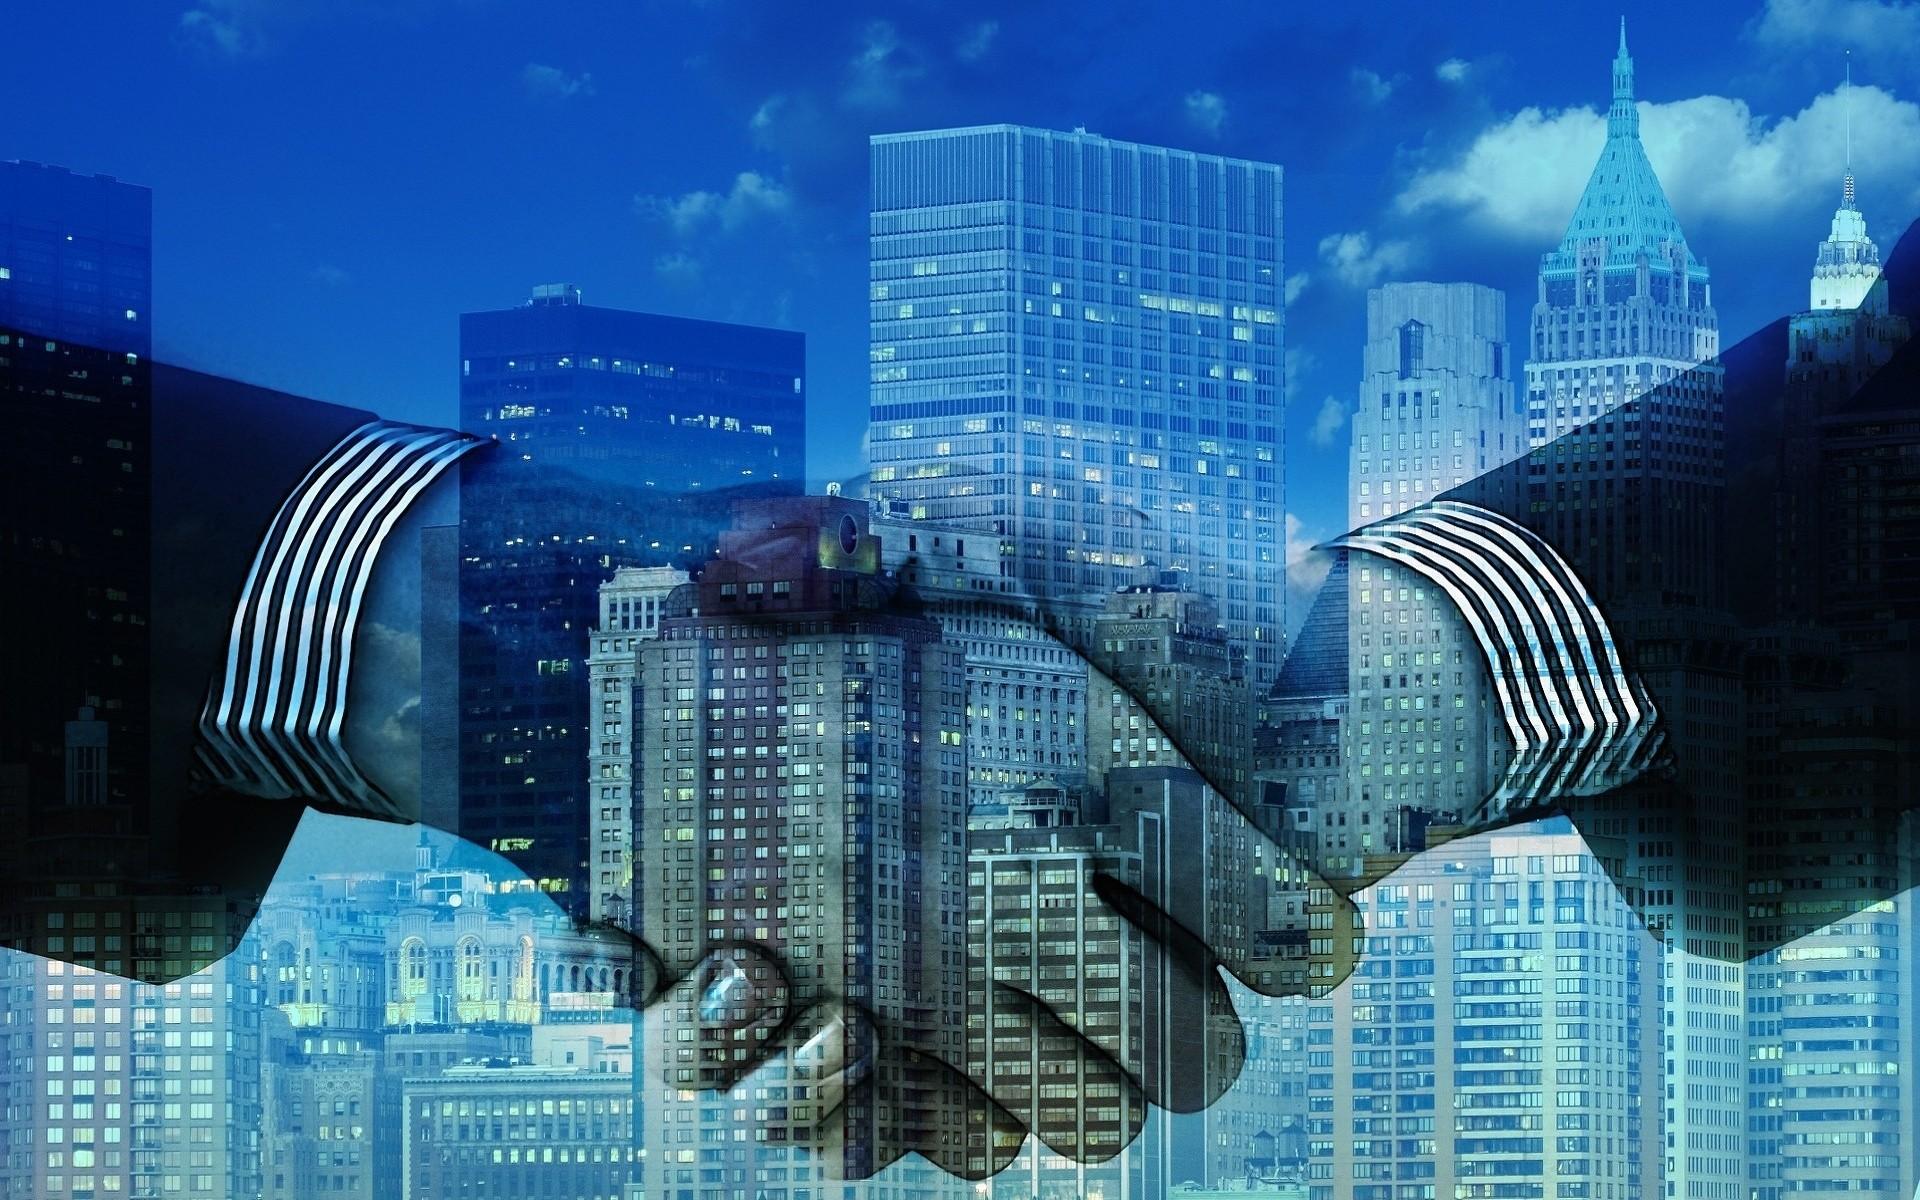 Res: 1920x1200, Hands, City, Business, Partnership, Partners, Handshake